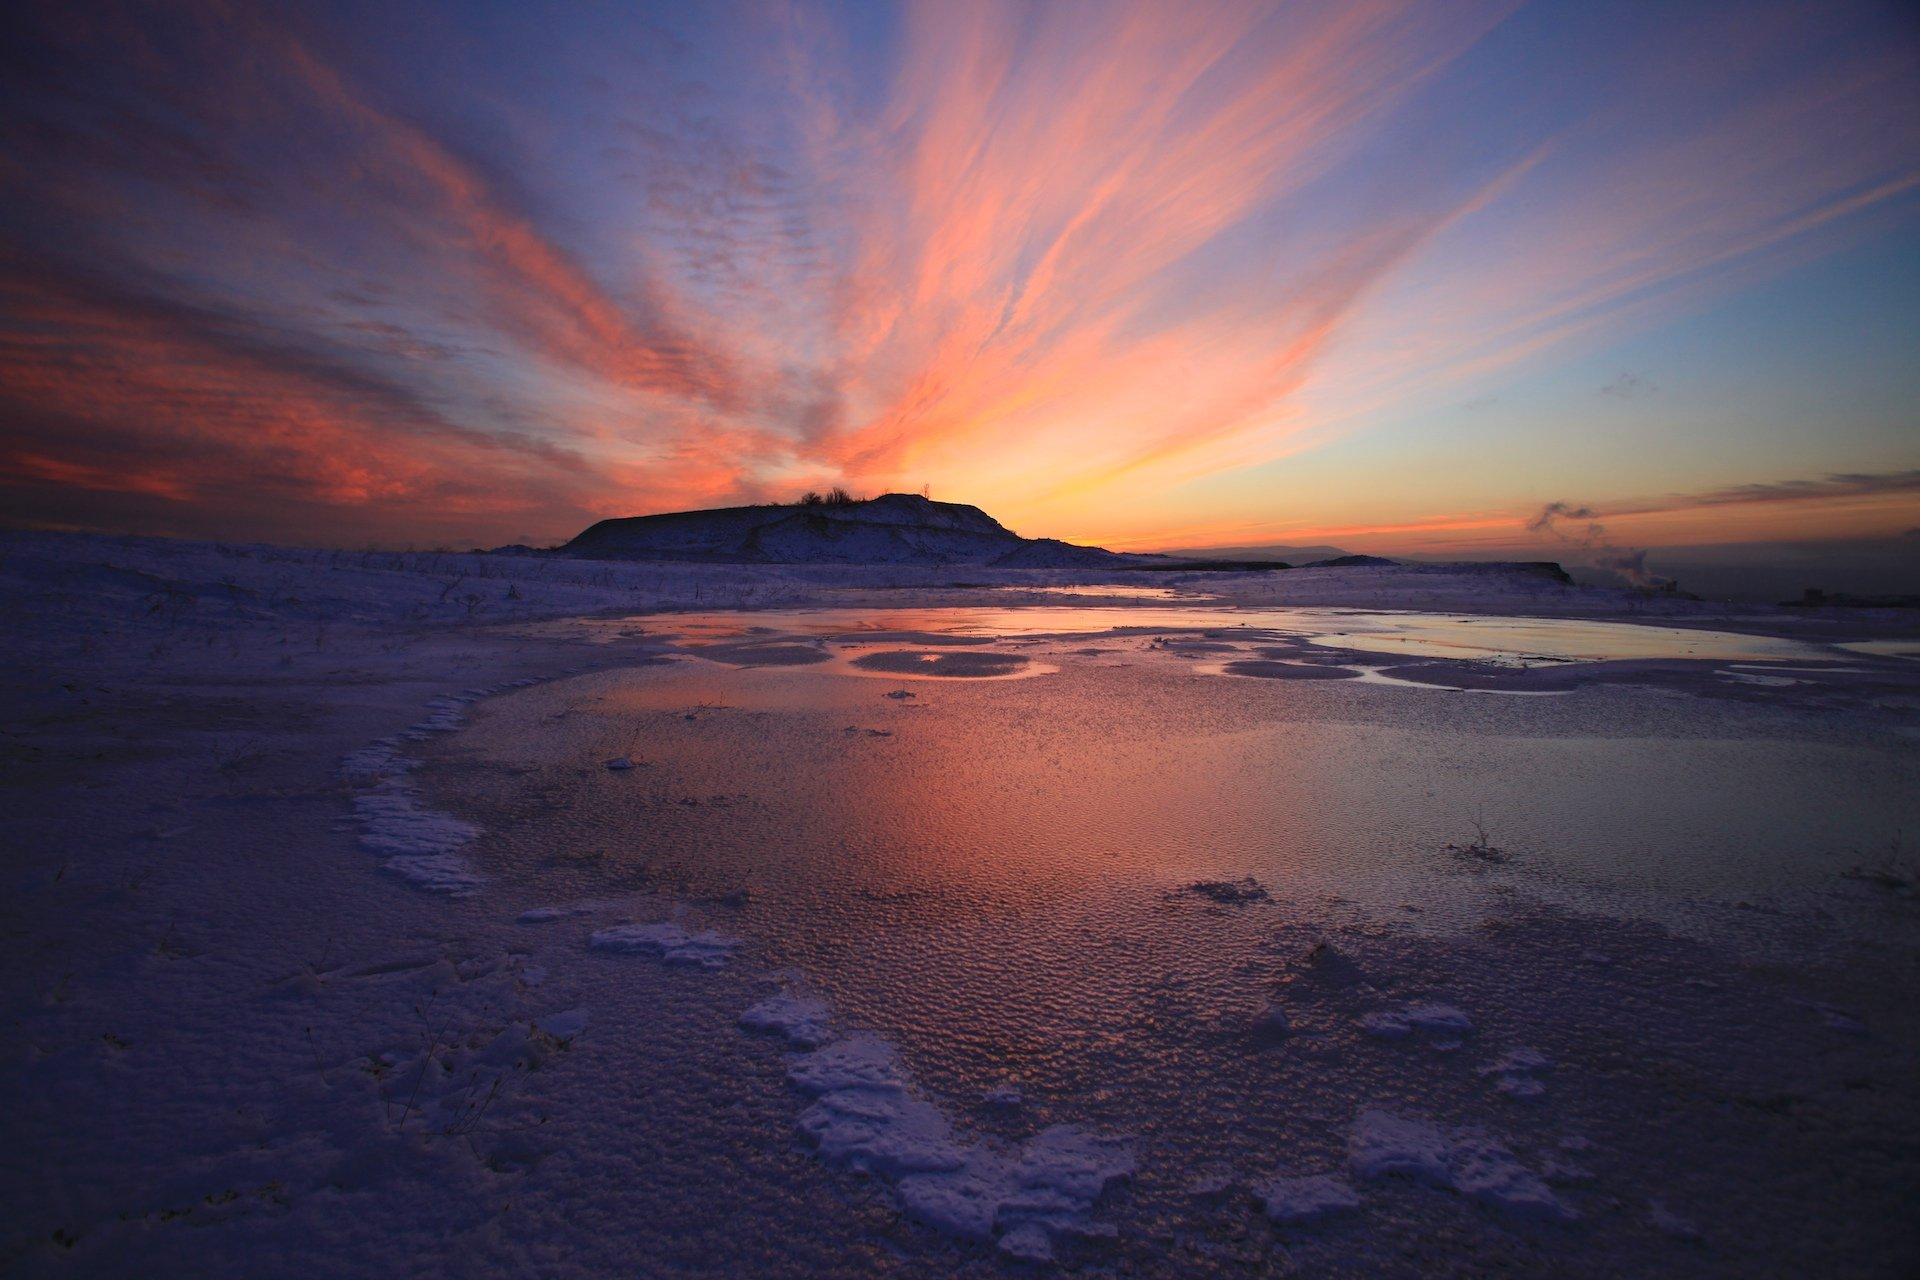 закат, облака, краски, красный, озеро, лед, зима, , Никифоров Егор